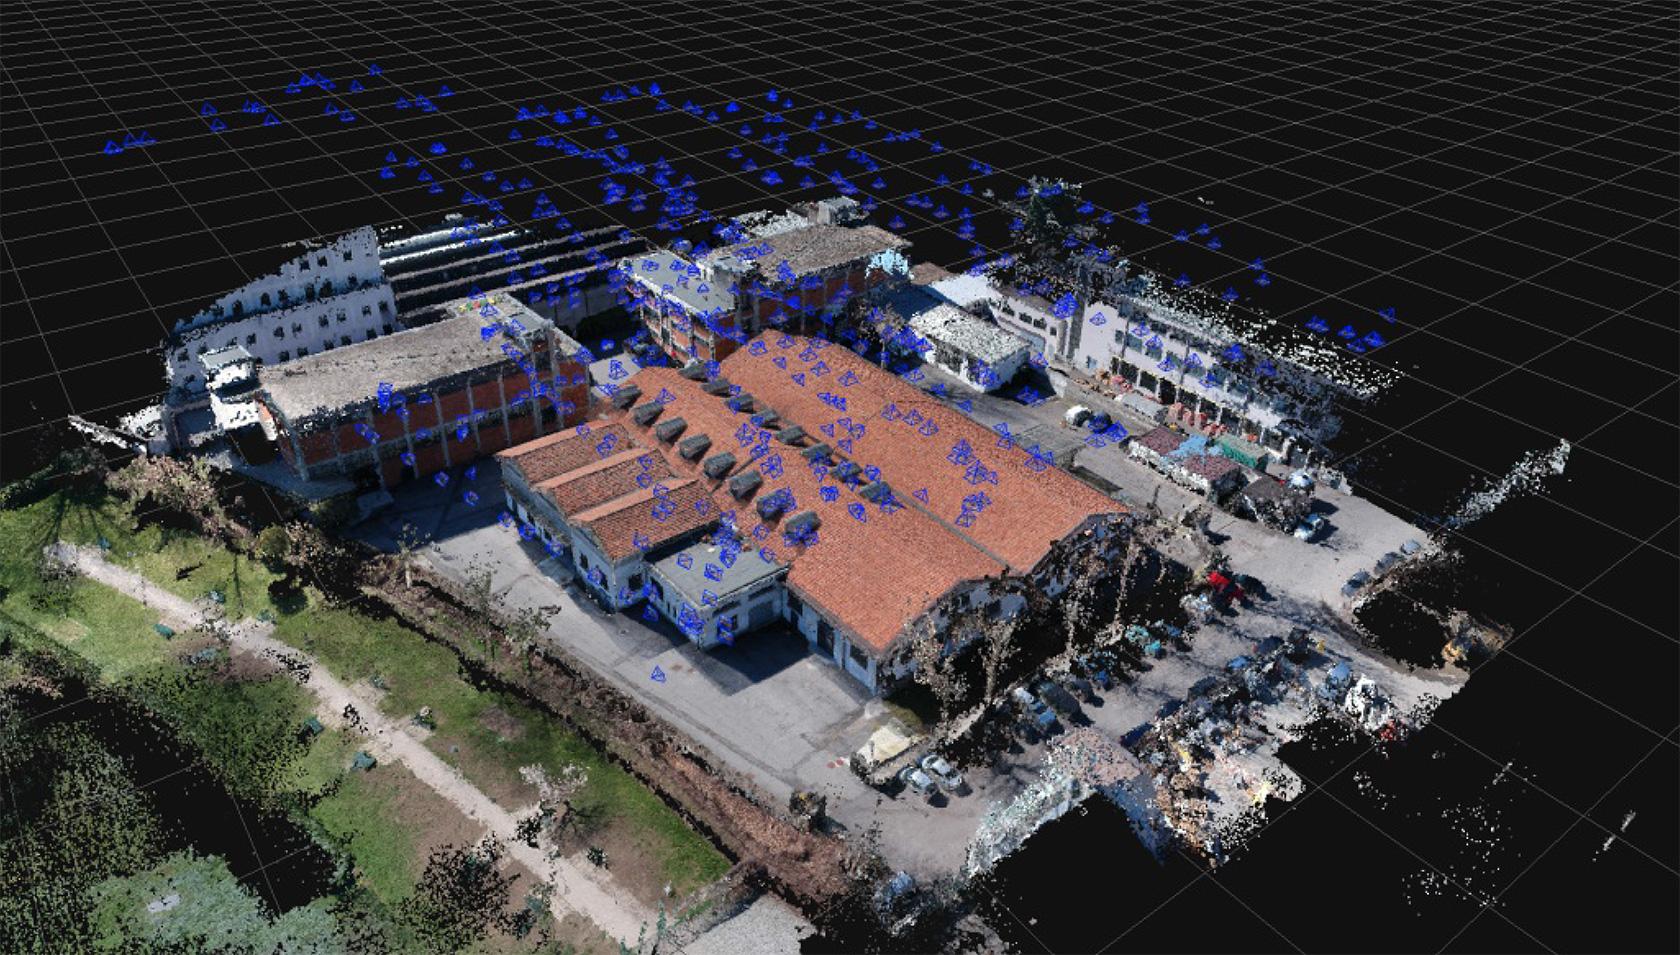 Photogrammetric Survey Using Drone